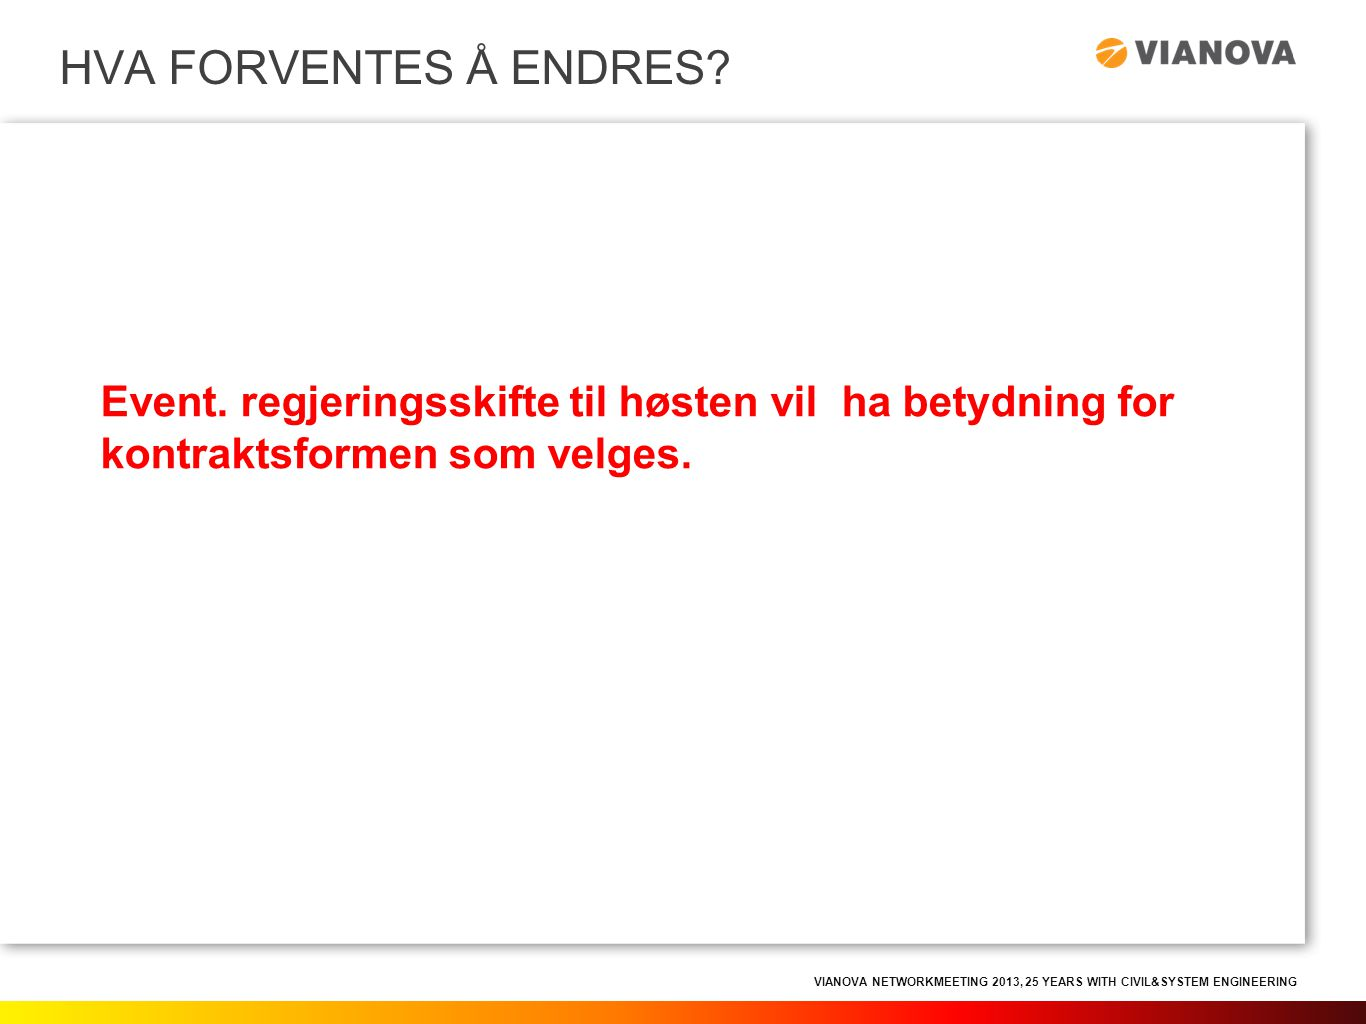 VIANOVA NETWORKMEETING 2013, 25 YEARS WITH CIVIL&SYSTEM ENGINEERING Event. regjeringsskifte til høsten vil ha betydning for kontraktsformen som velges